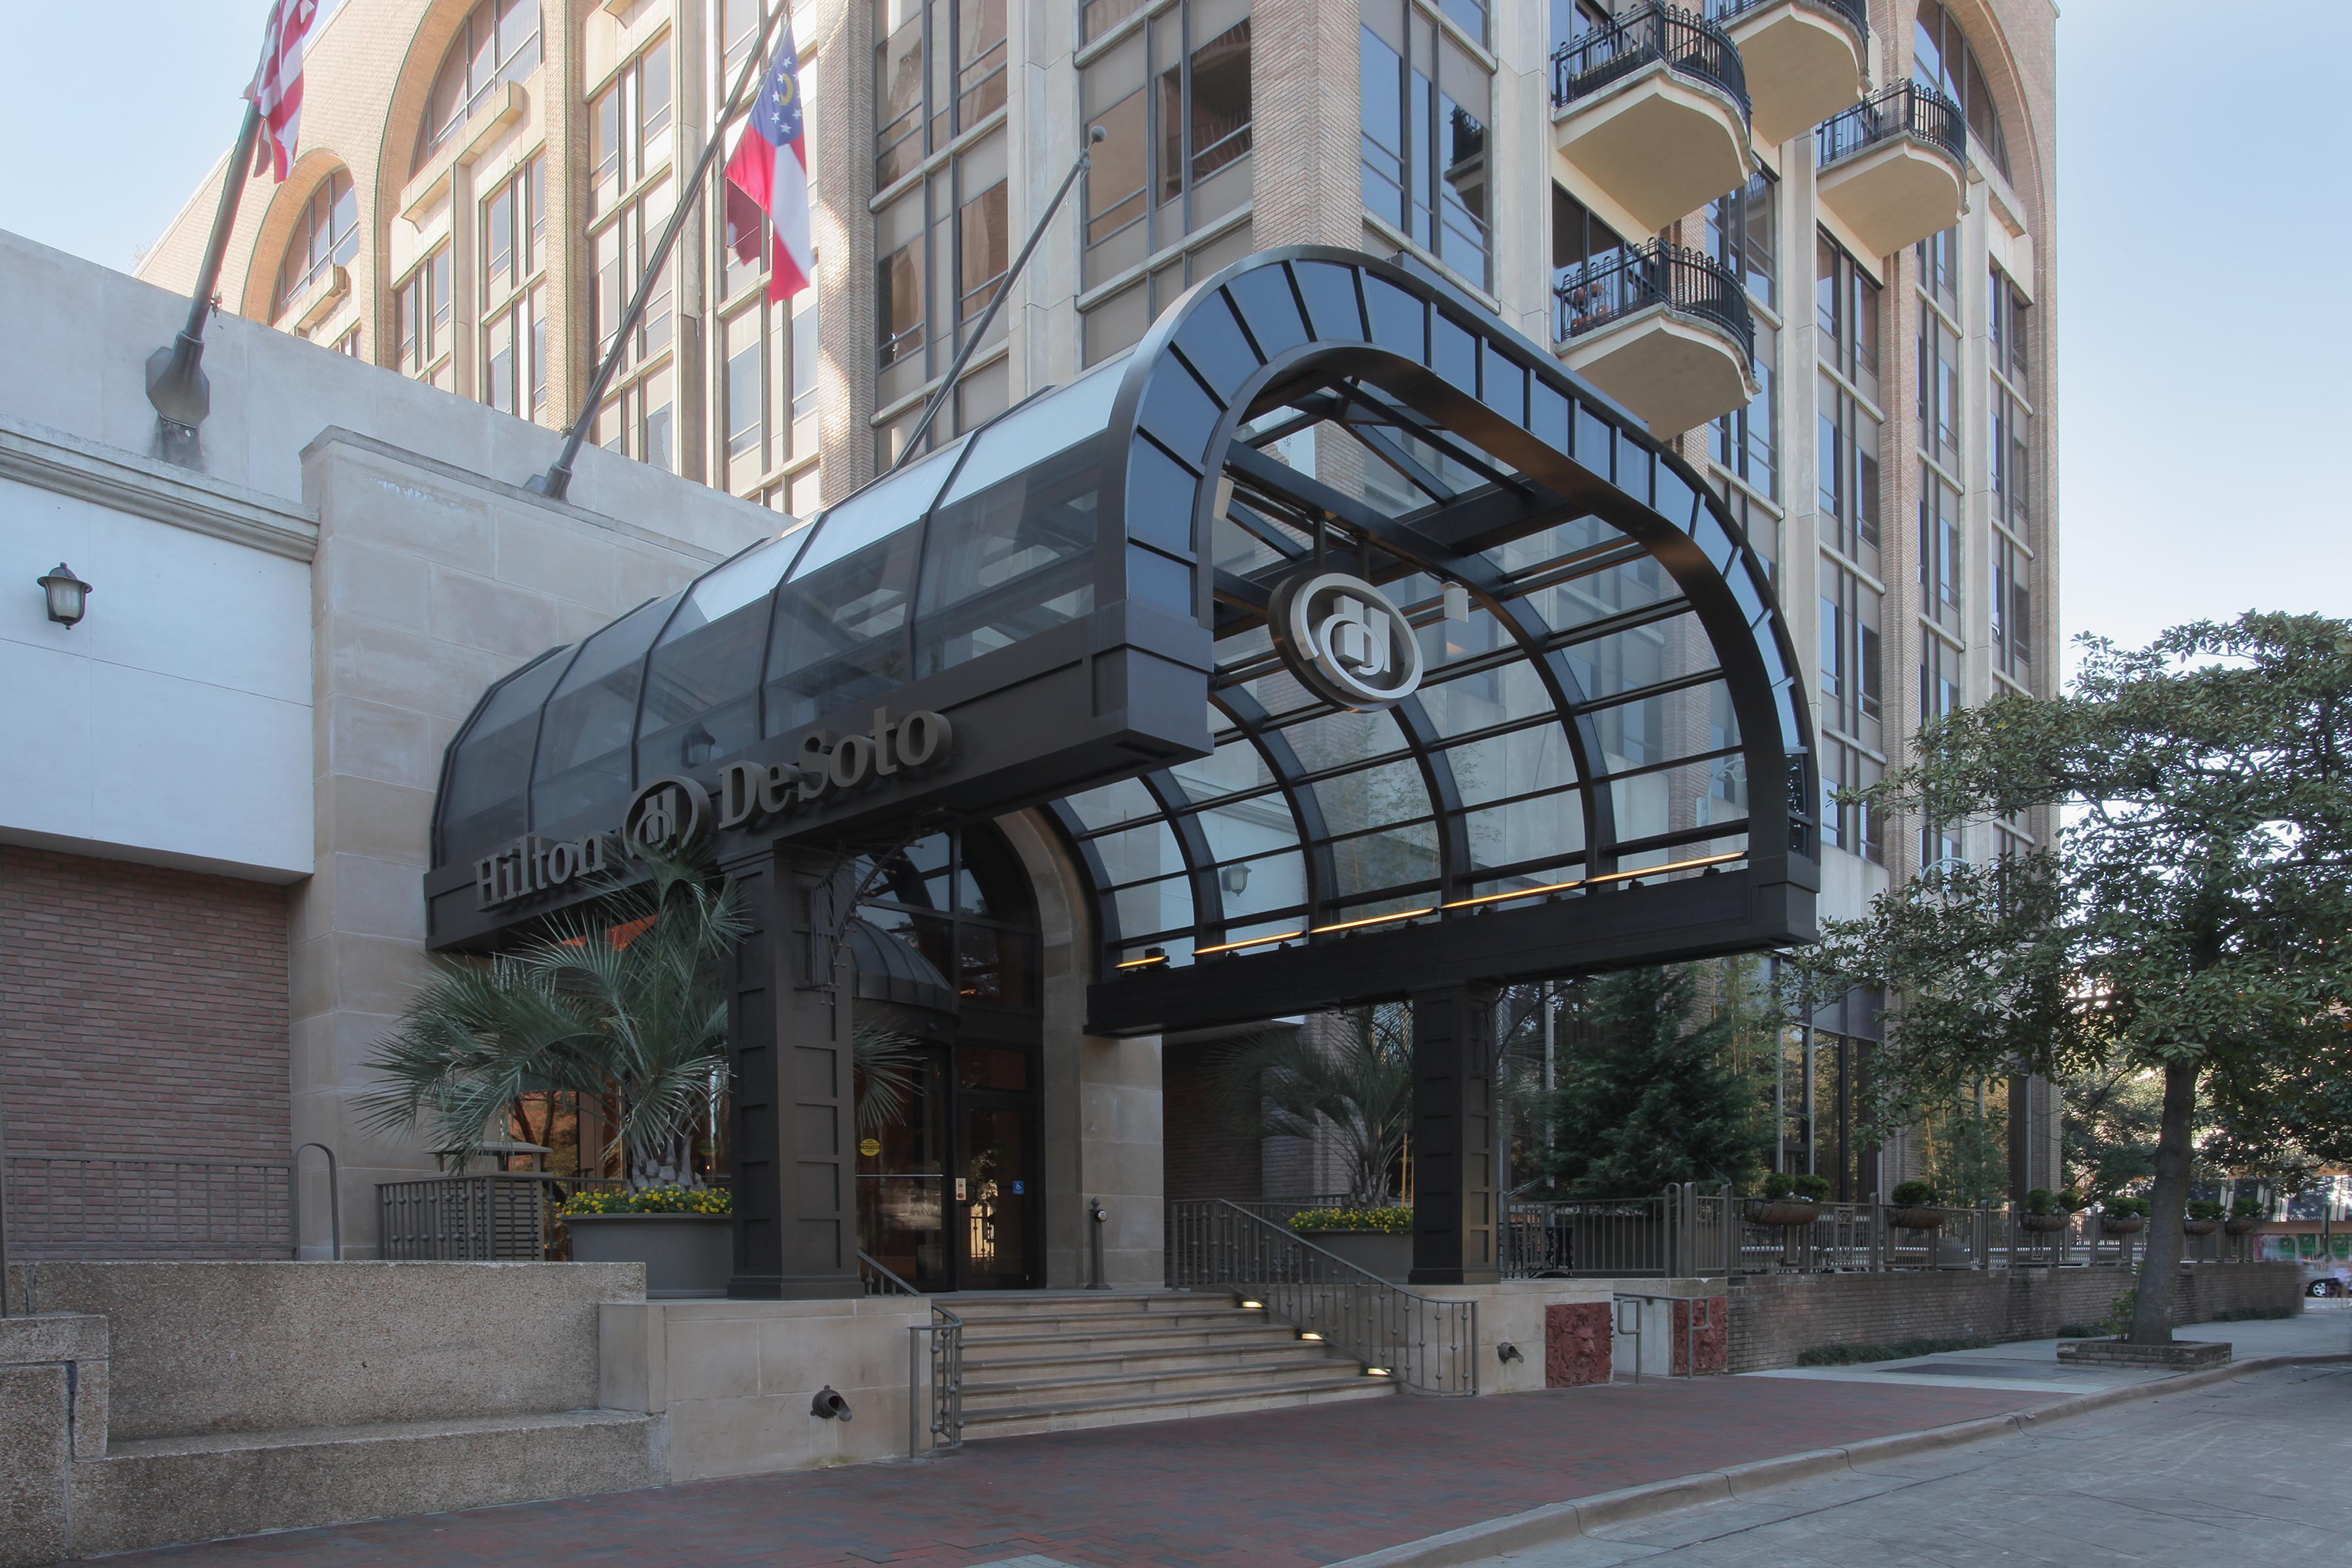 Historic Hilton Desoto Hotel Renovation Features Super Sky